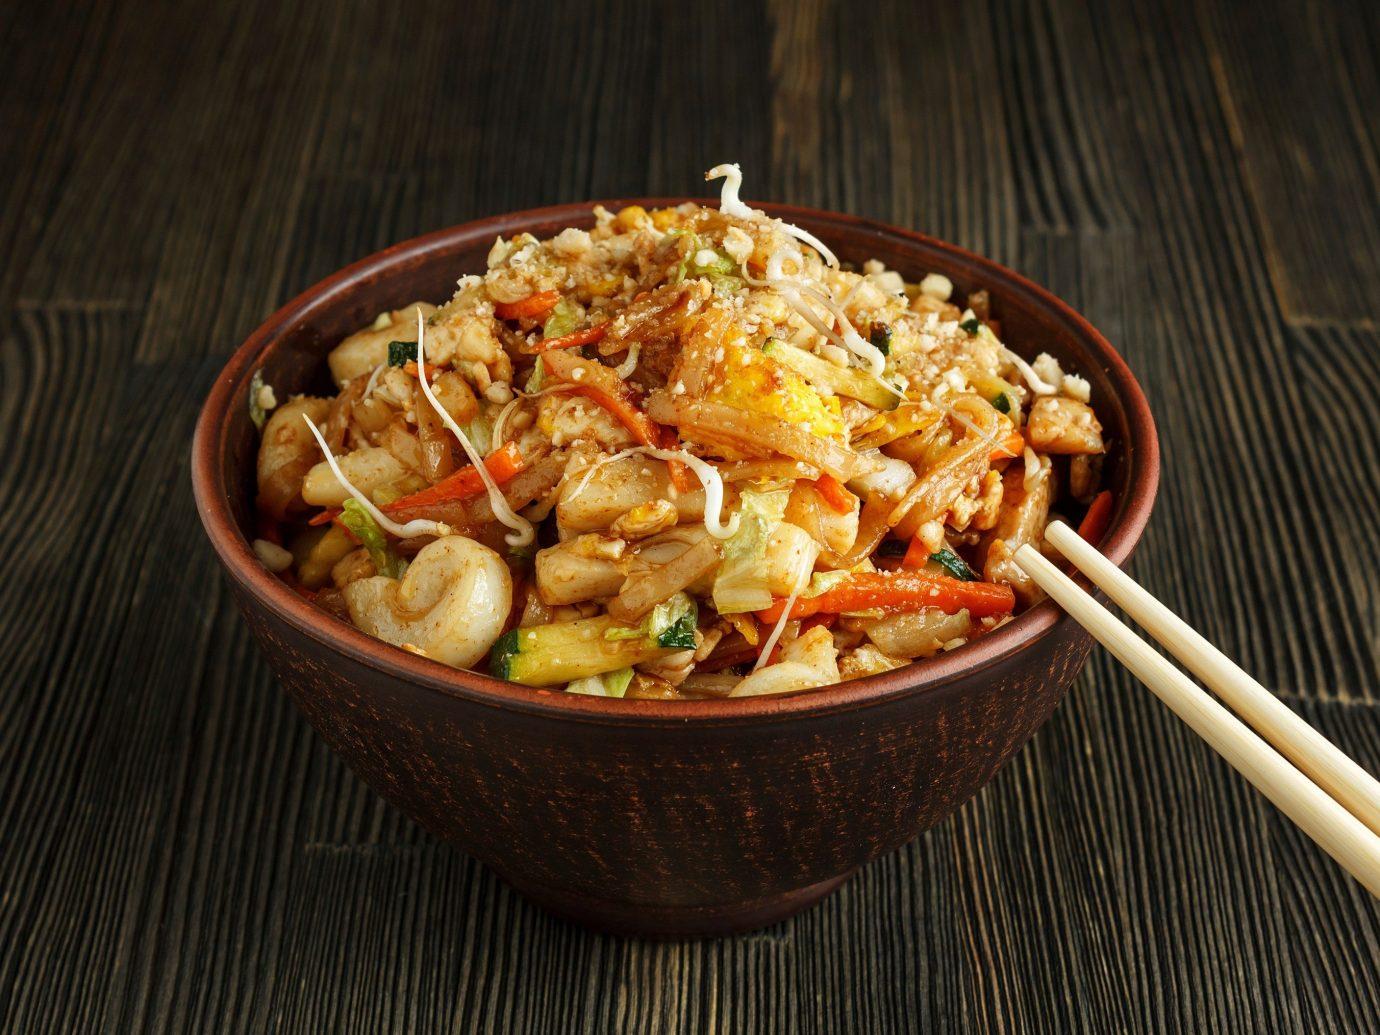 Food + Drink food table dish indoor cuisine asian food meal produce thai food chinese food Seafood vegetarian food vegetable